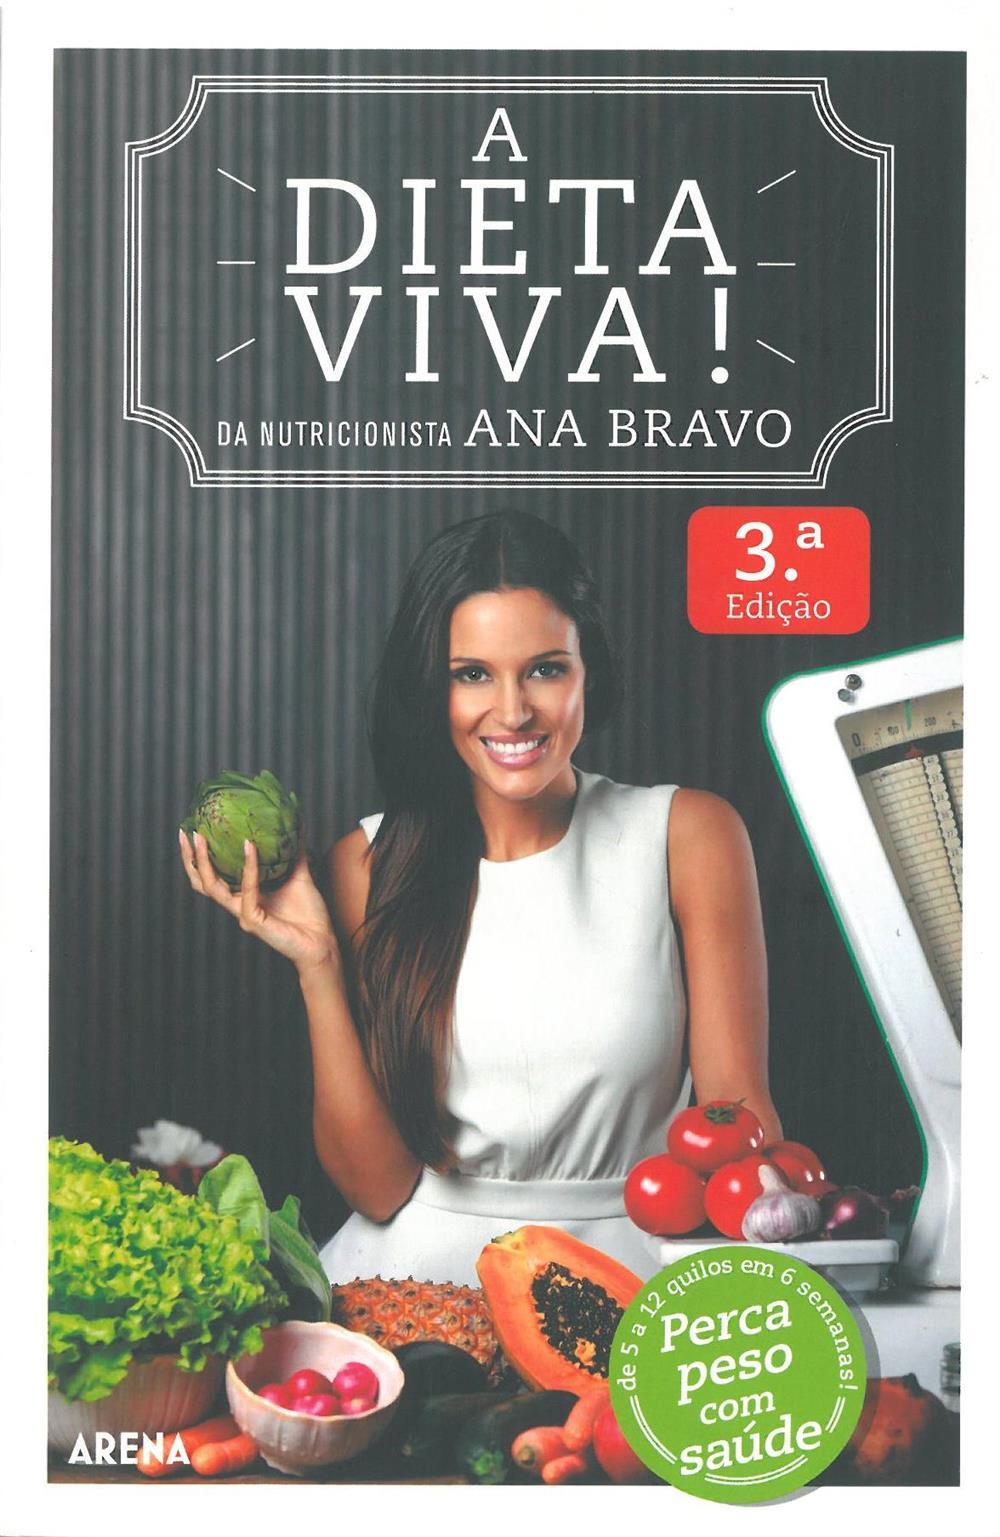 A dieta viva_.jpg